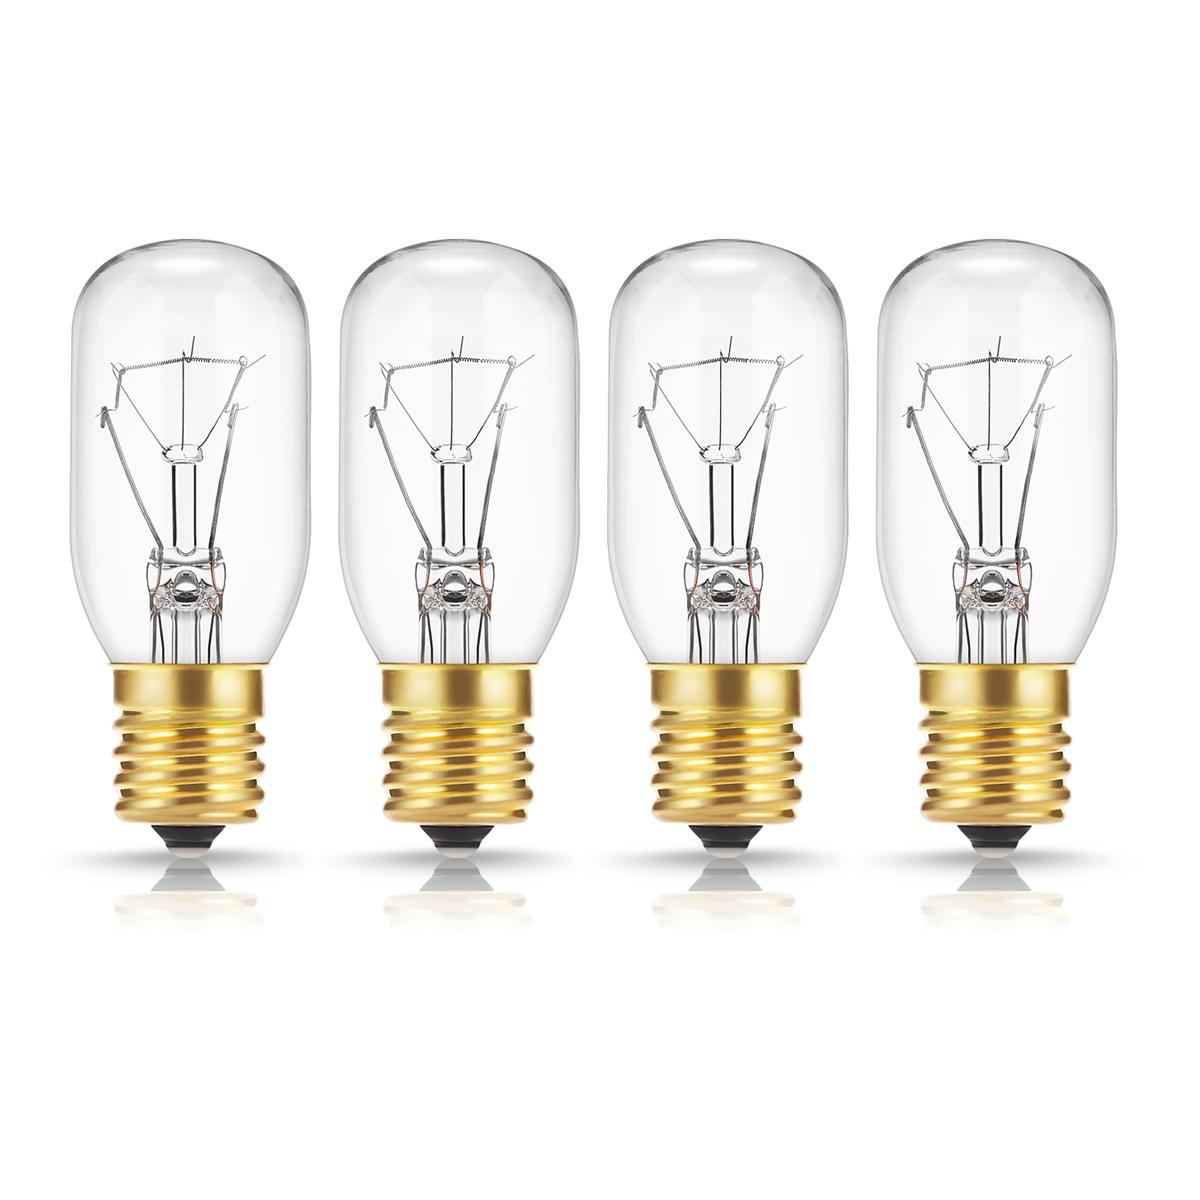 40 watt appliance light bulb t8 tubular incandescent light bulbs microwave oven replacement bulb e17 base dimmable warm white 4 pack